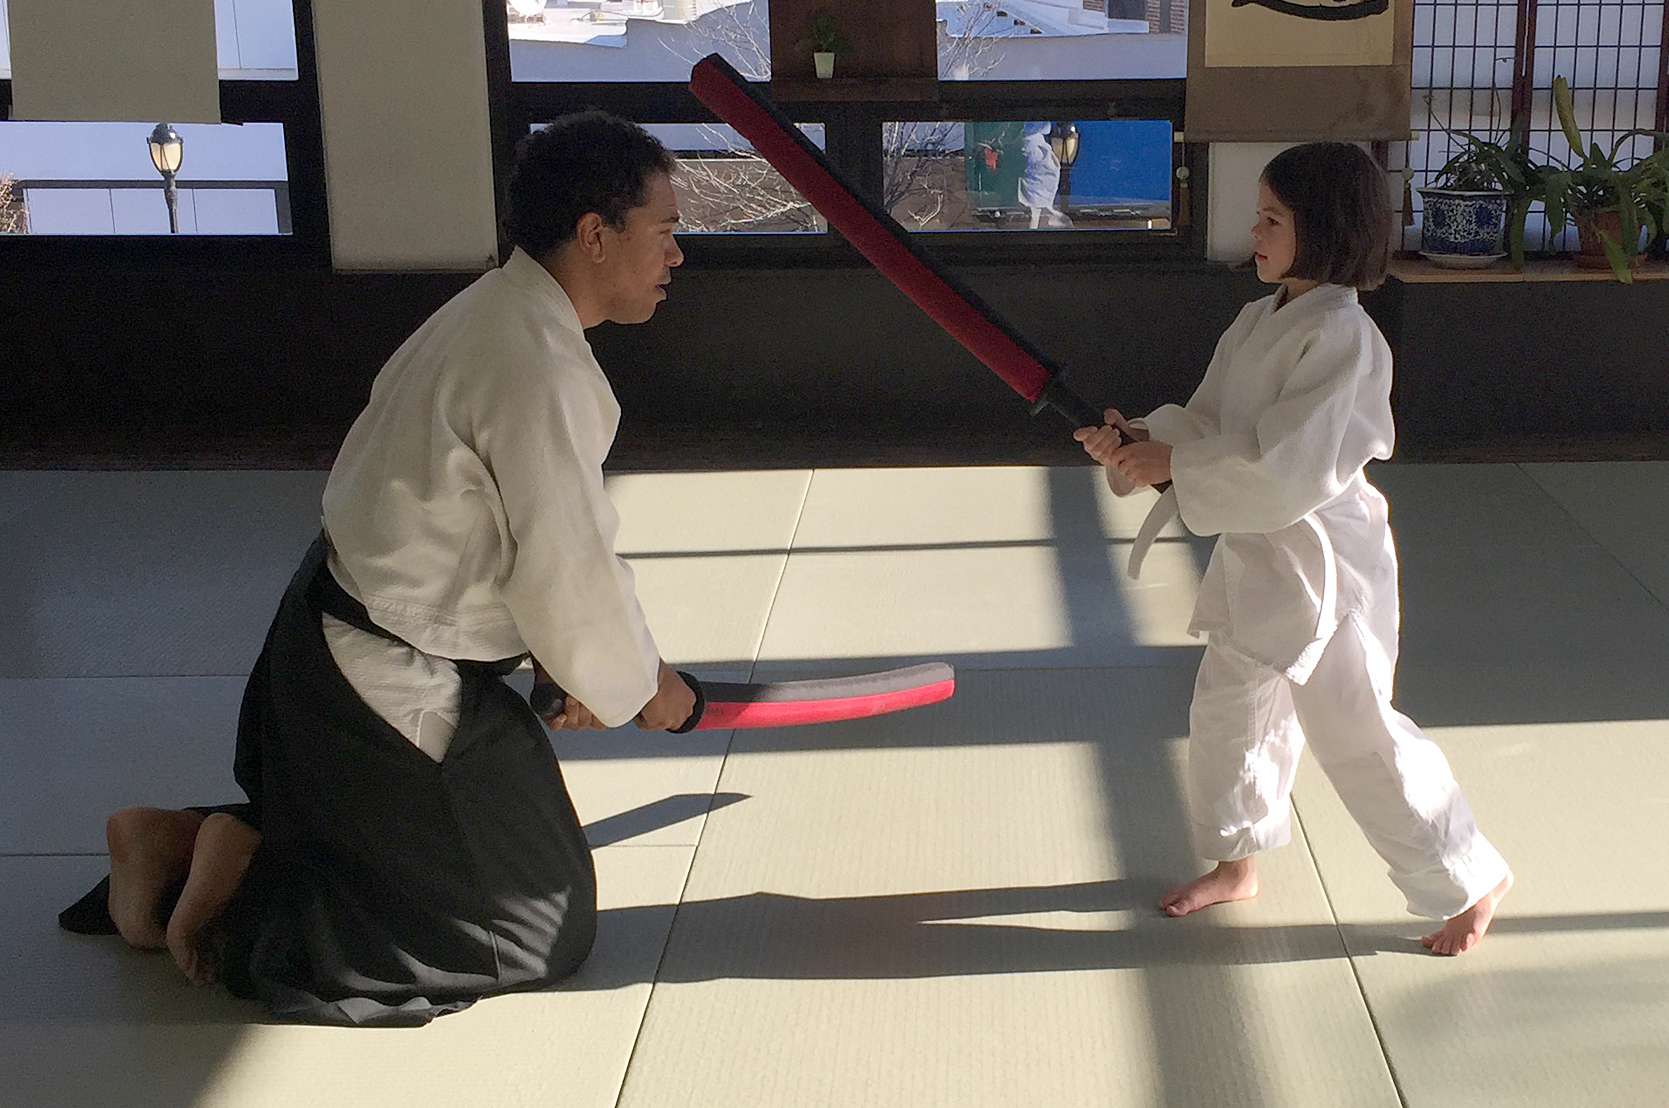 3_kids_aikido-westchester-ny.jpg